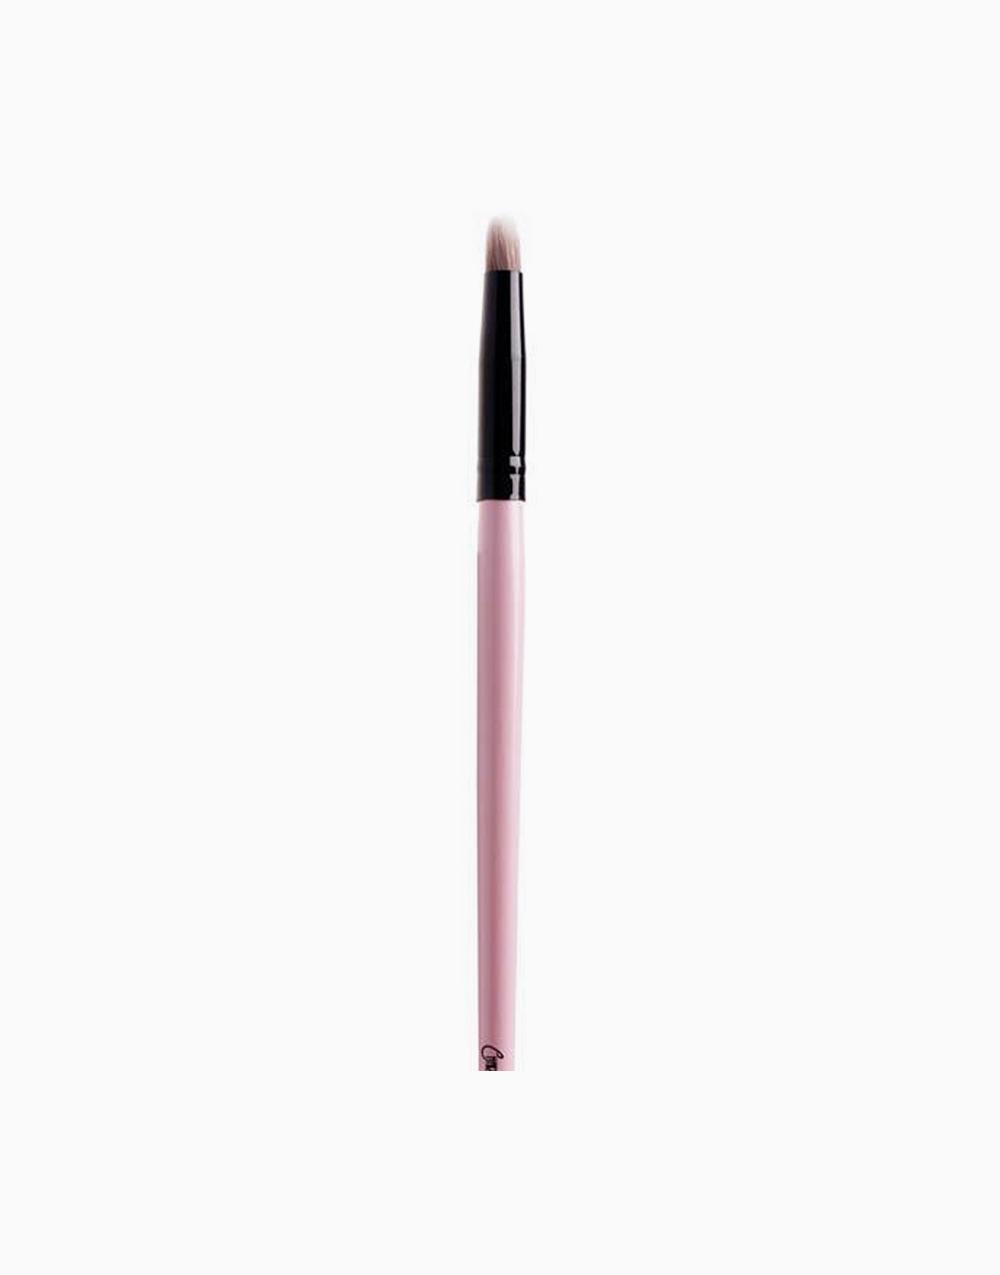 Vegan Pencil Point Brush by Charm